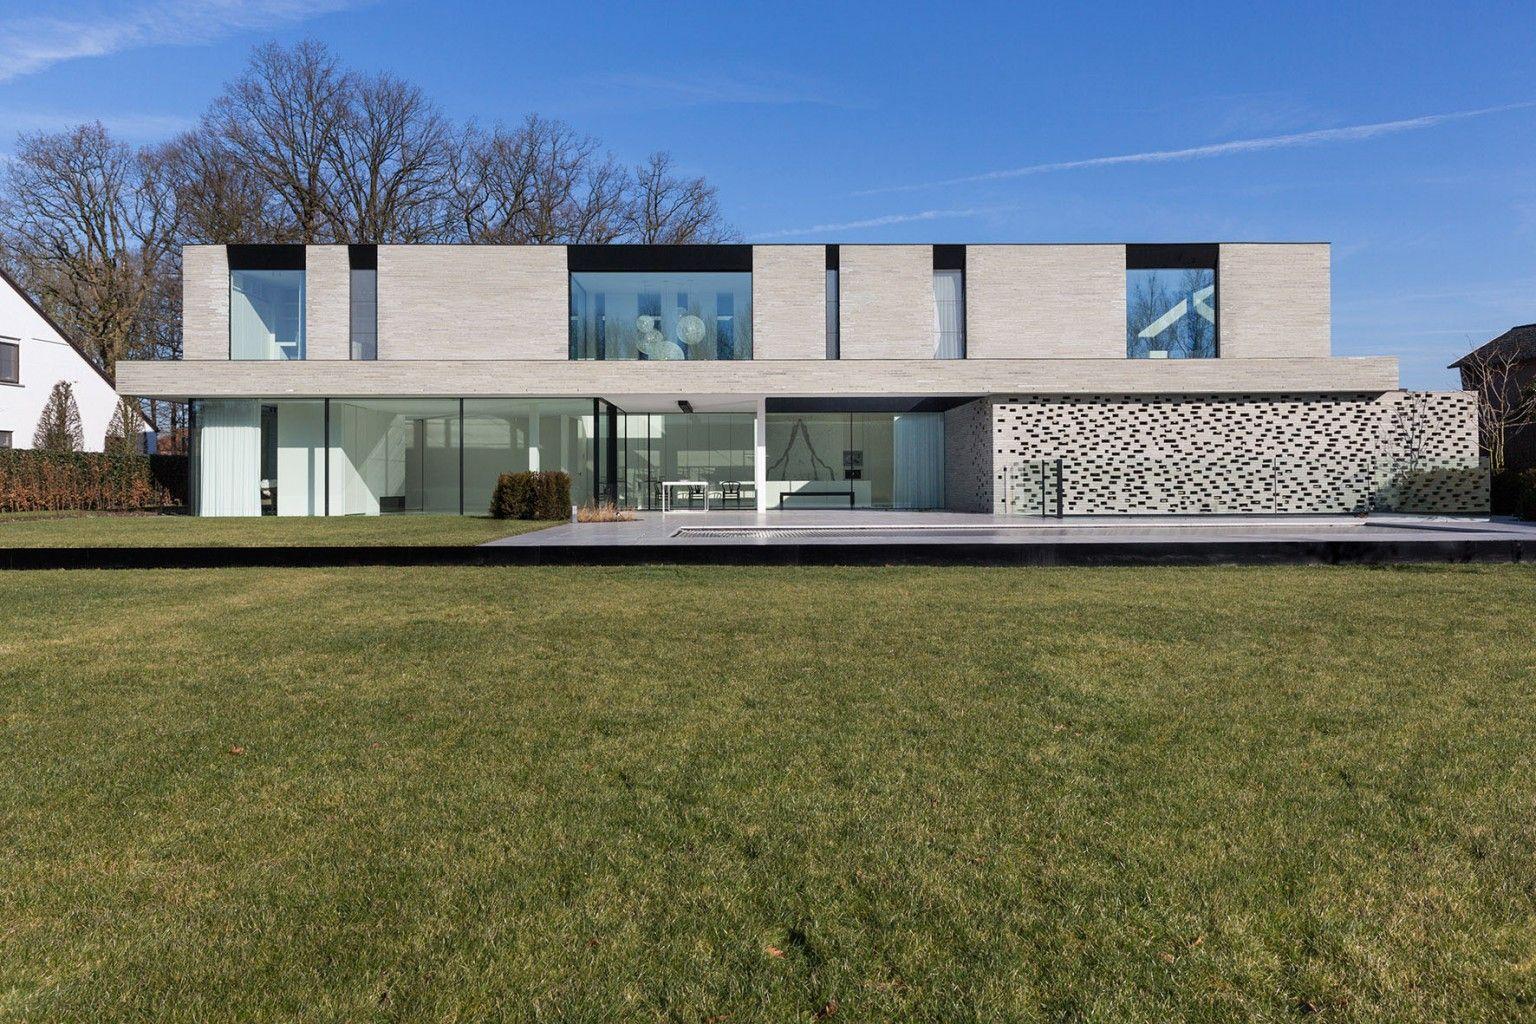 Villa B - Il Granito natuursteen | Häuser | Pinterest | Moderne ...